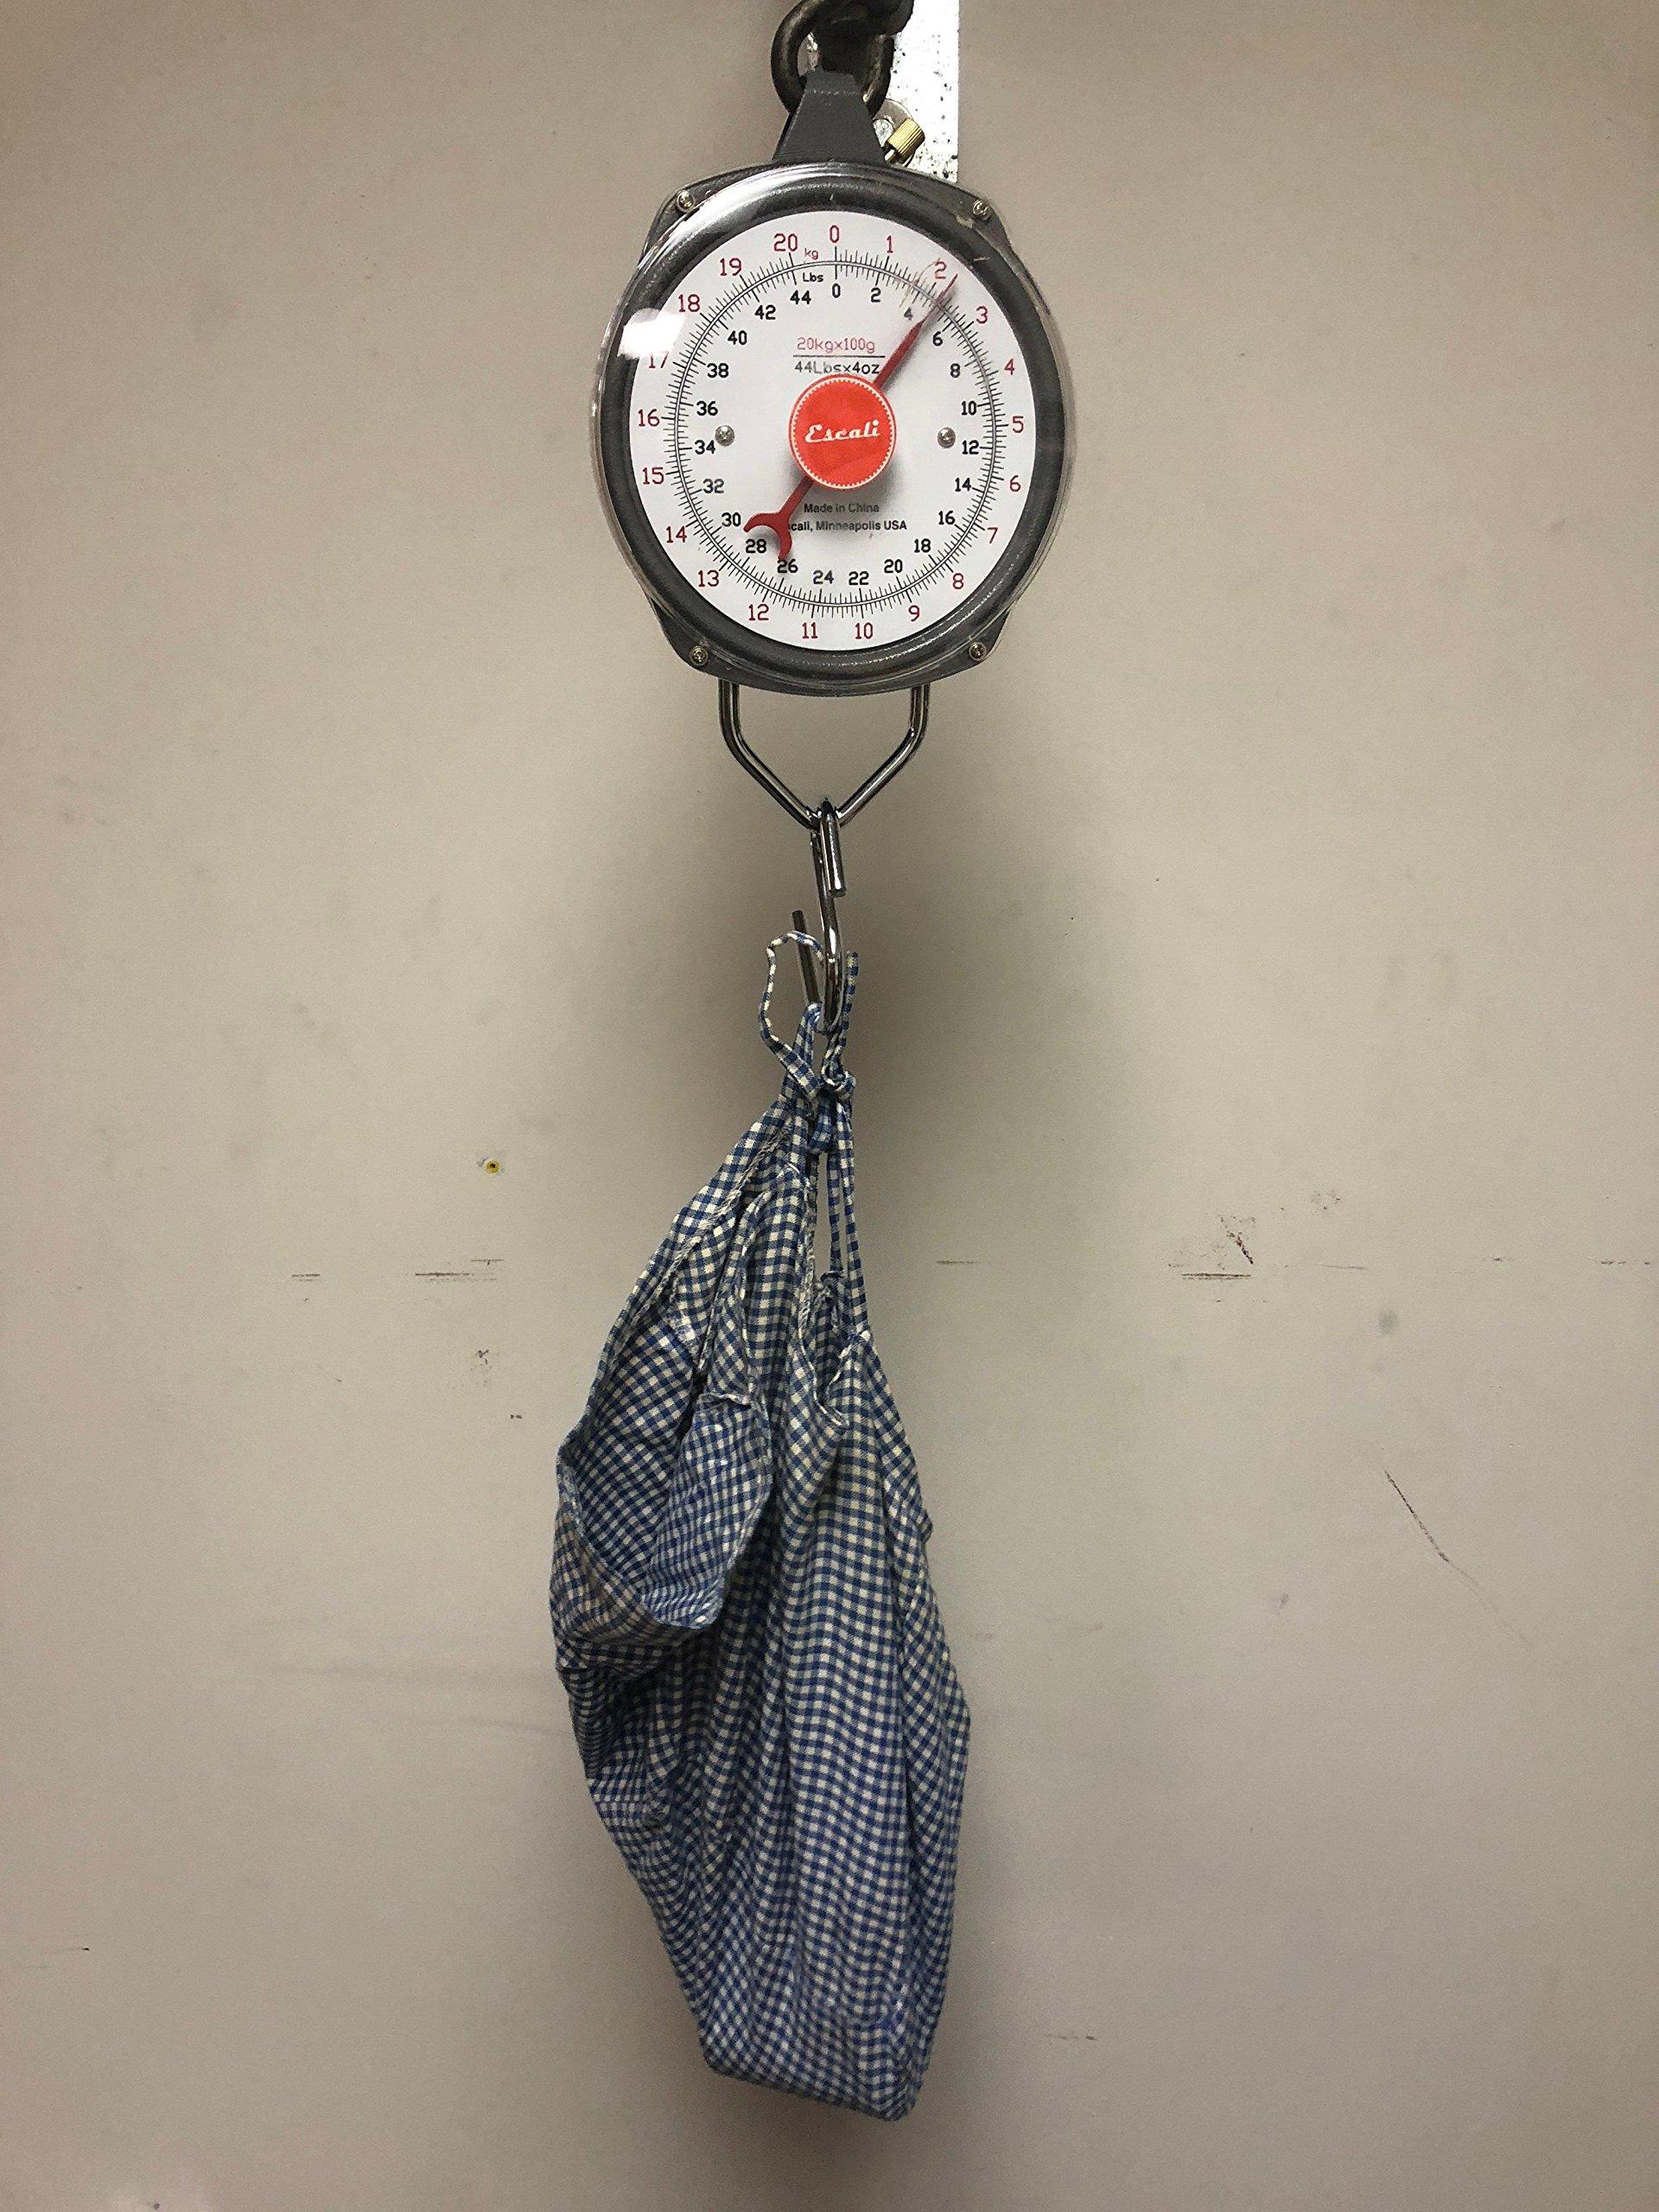 Escali, H4420, Hanging Scale, 44 lb x 4 oz